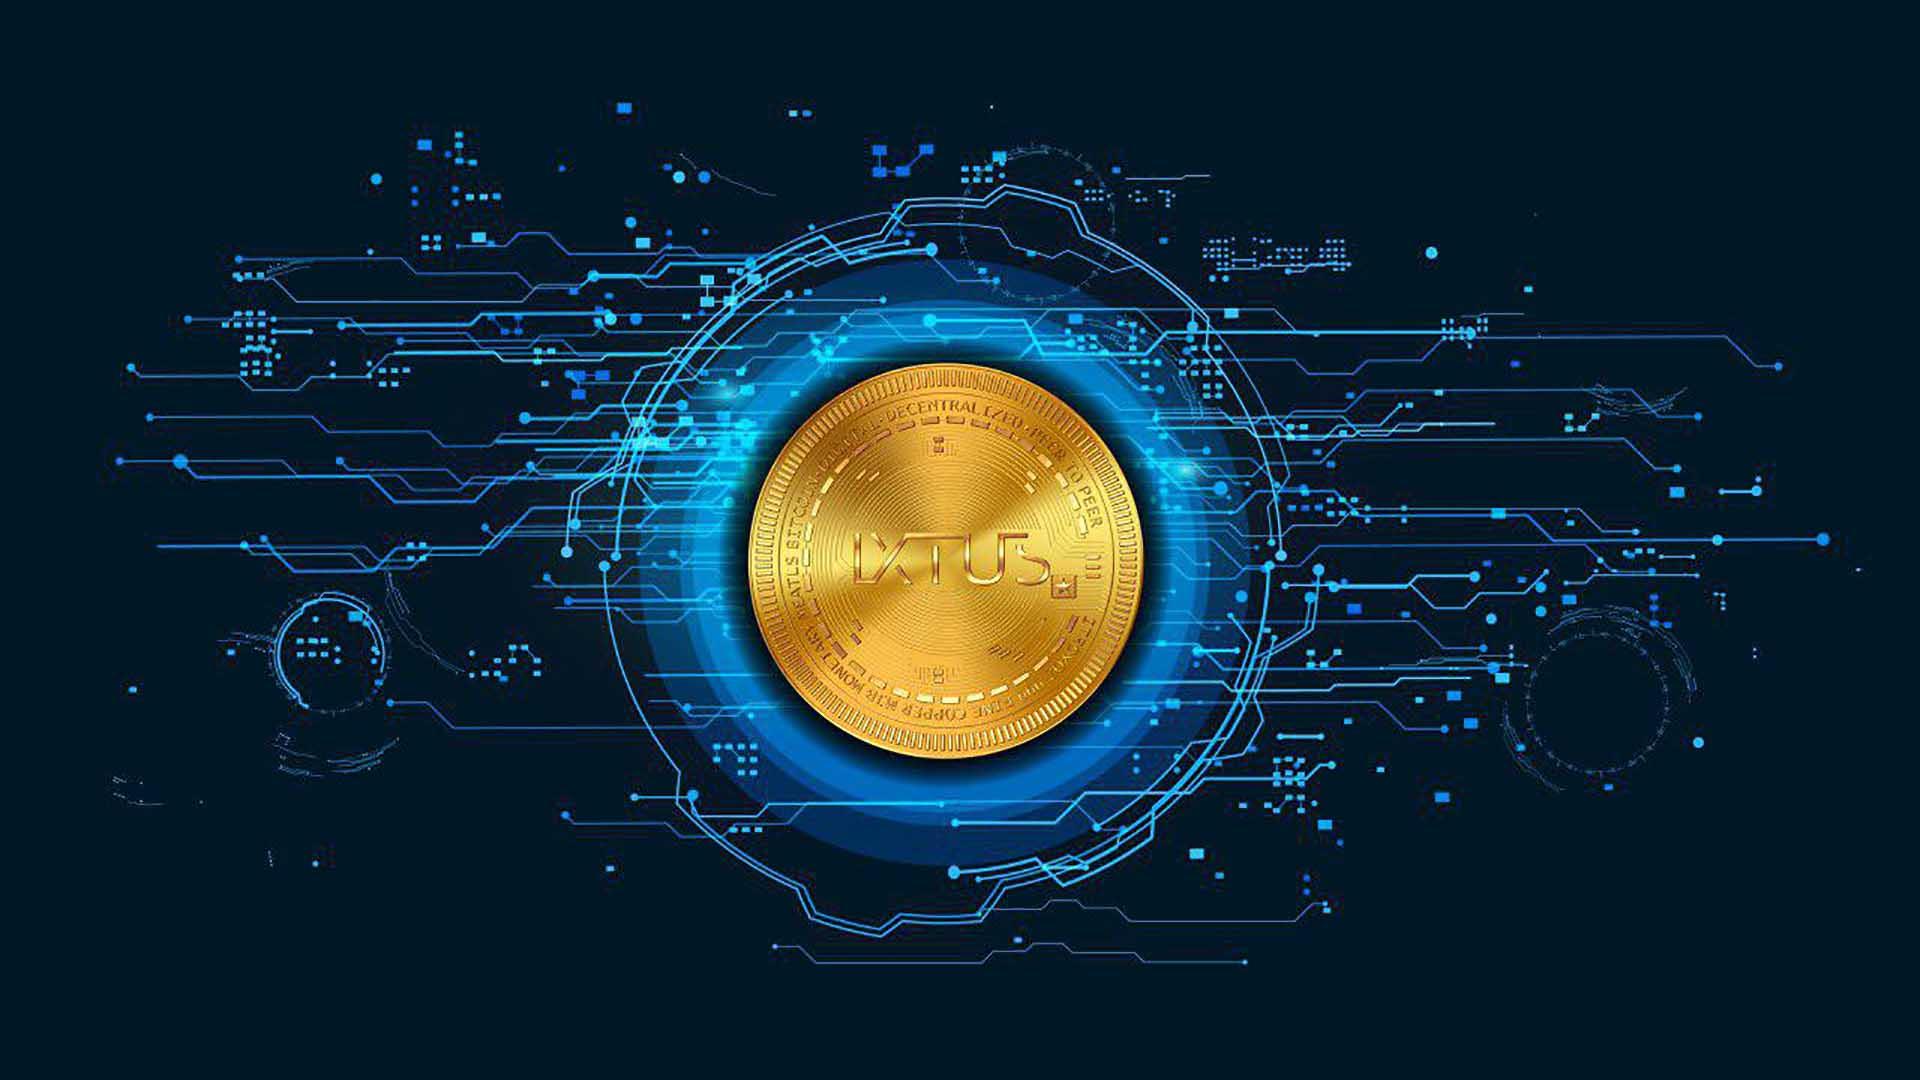 First Blockchain-Powered Edutainment Platform Raises $5.5 Millions in Pre-ICO, Offering 25% Bonus This Week on ICO